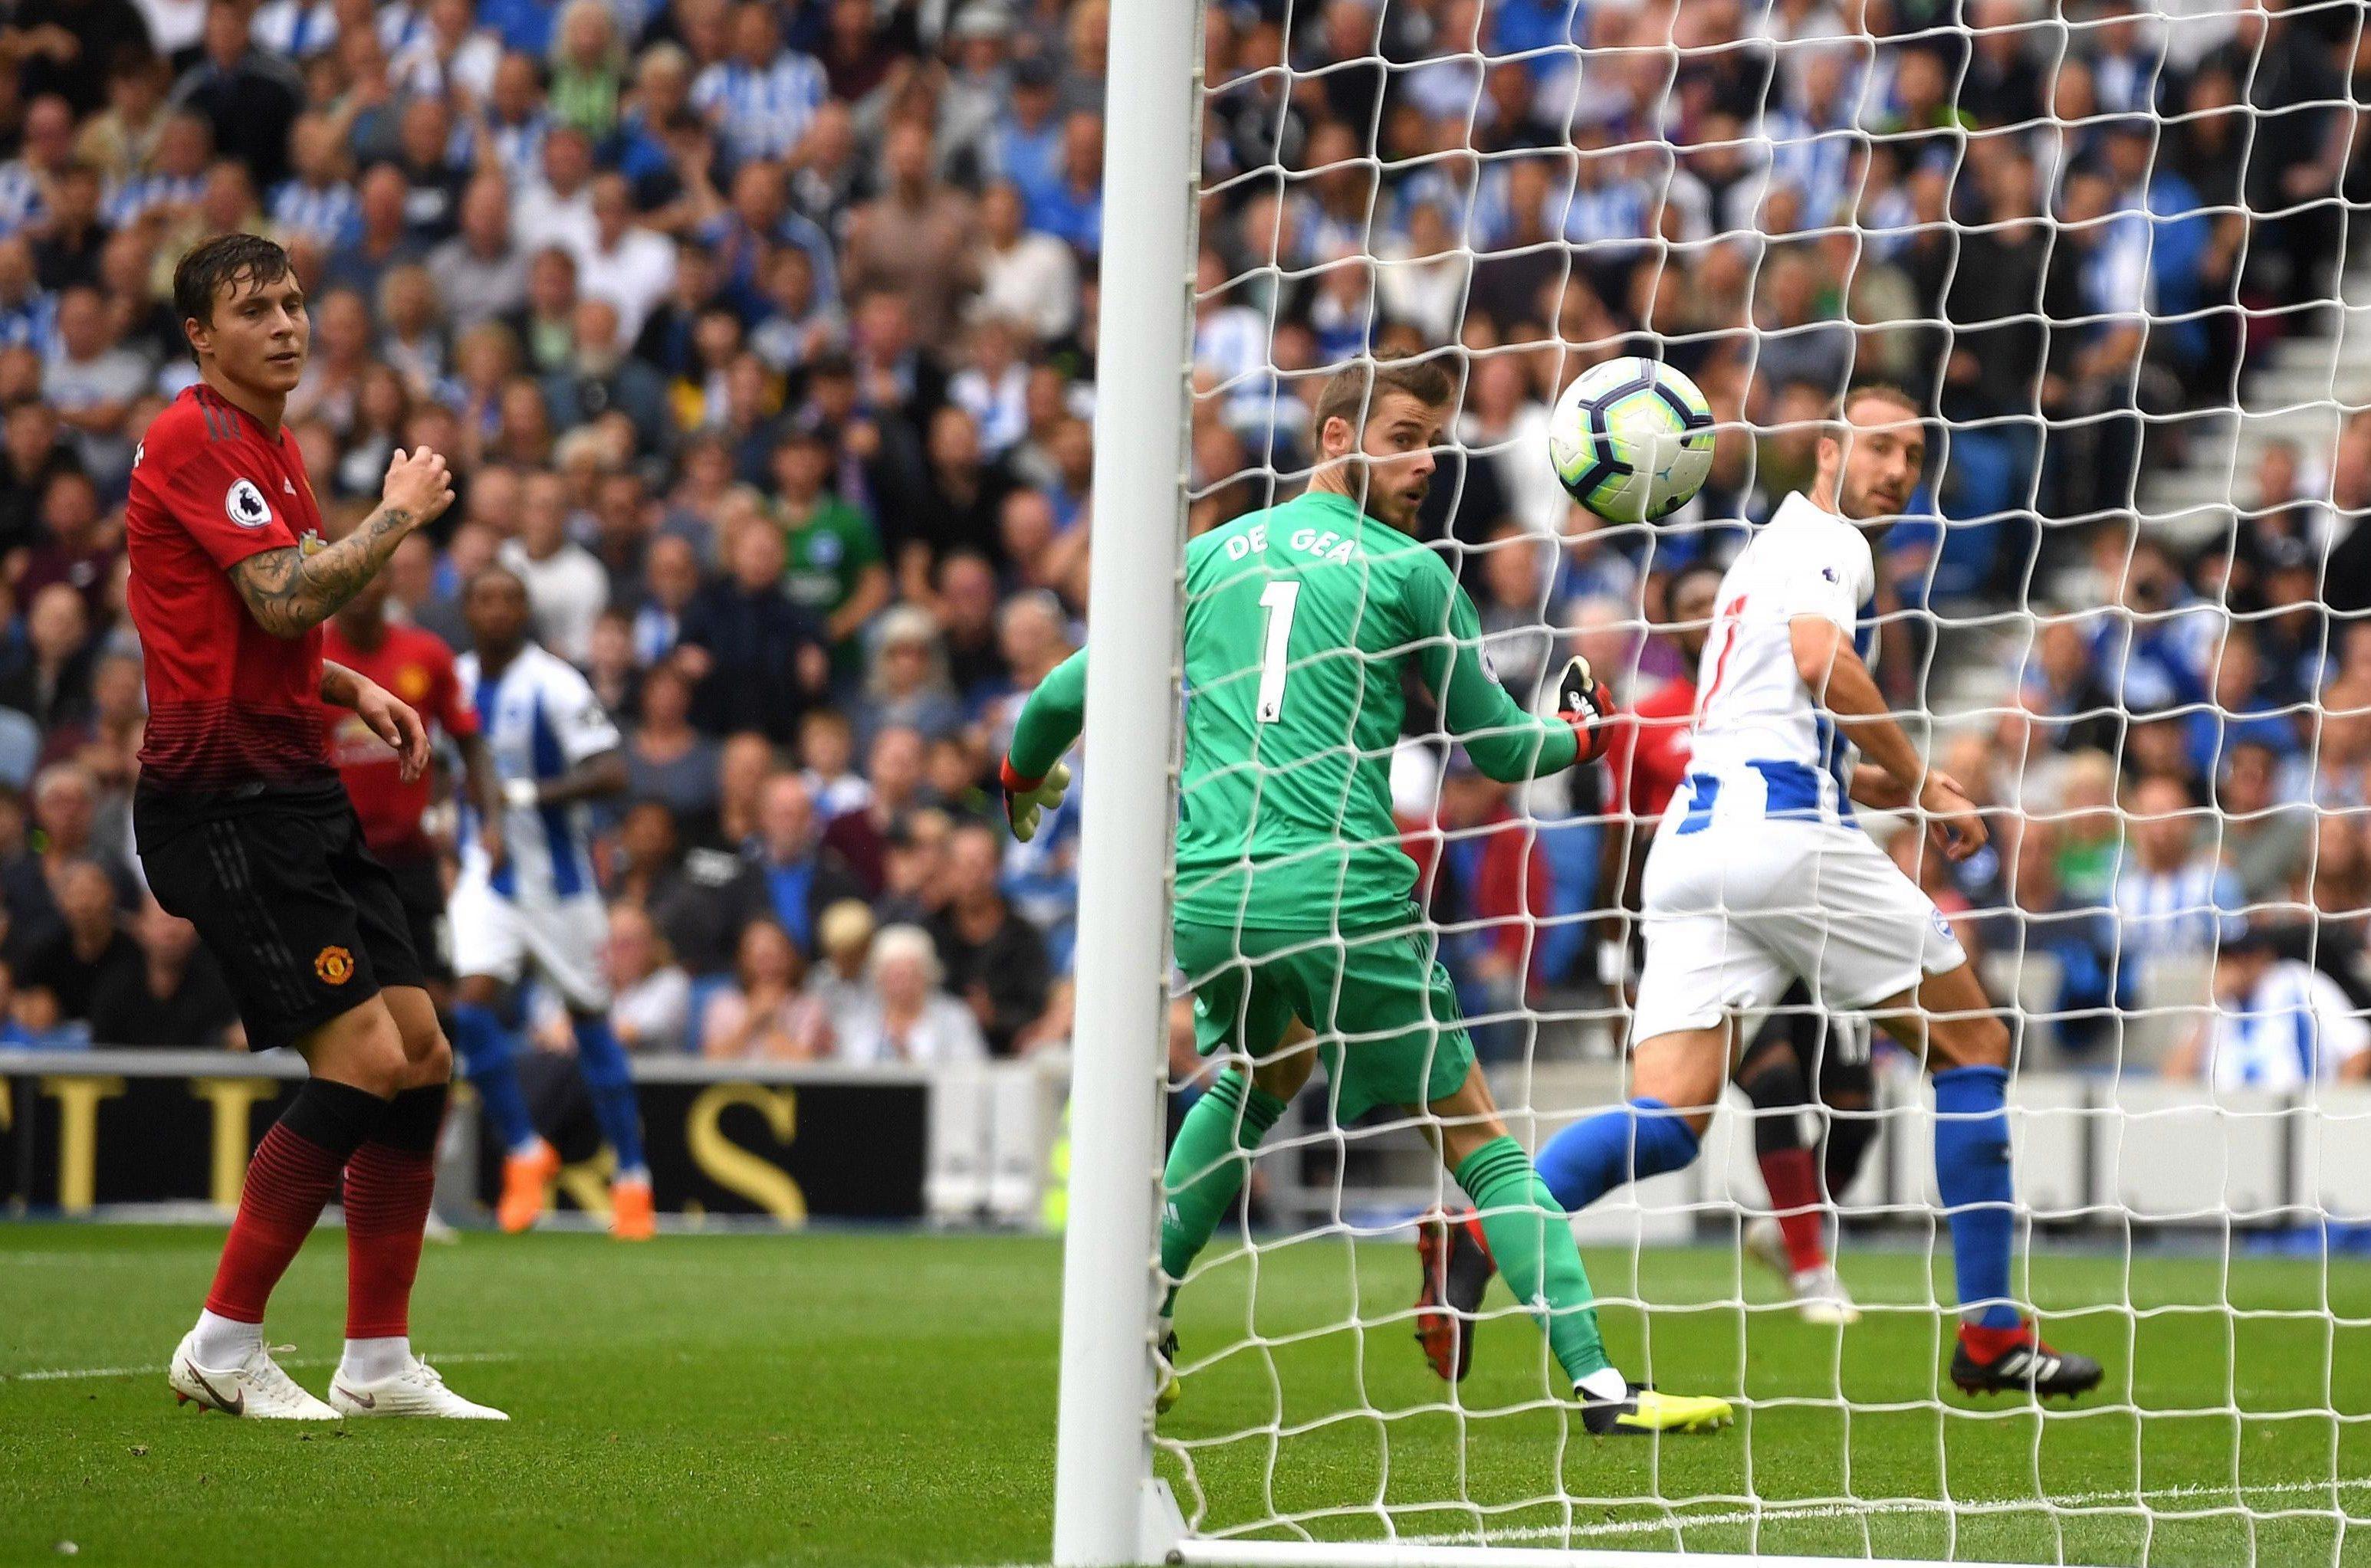 Glenn Murray rolled back the years to break the deadlock against Man United